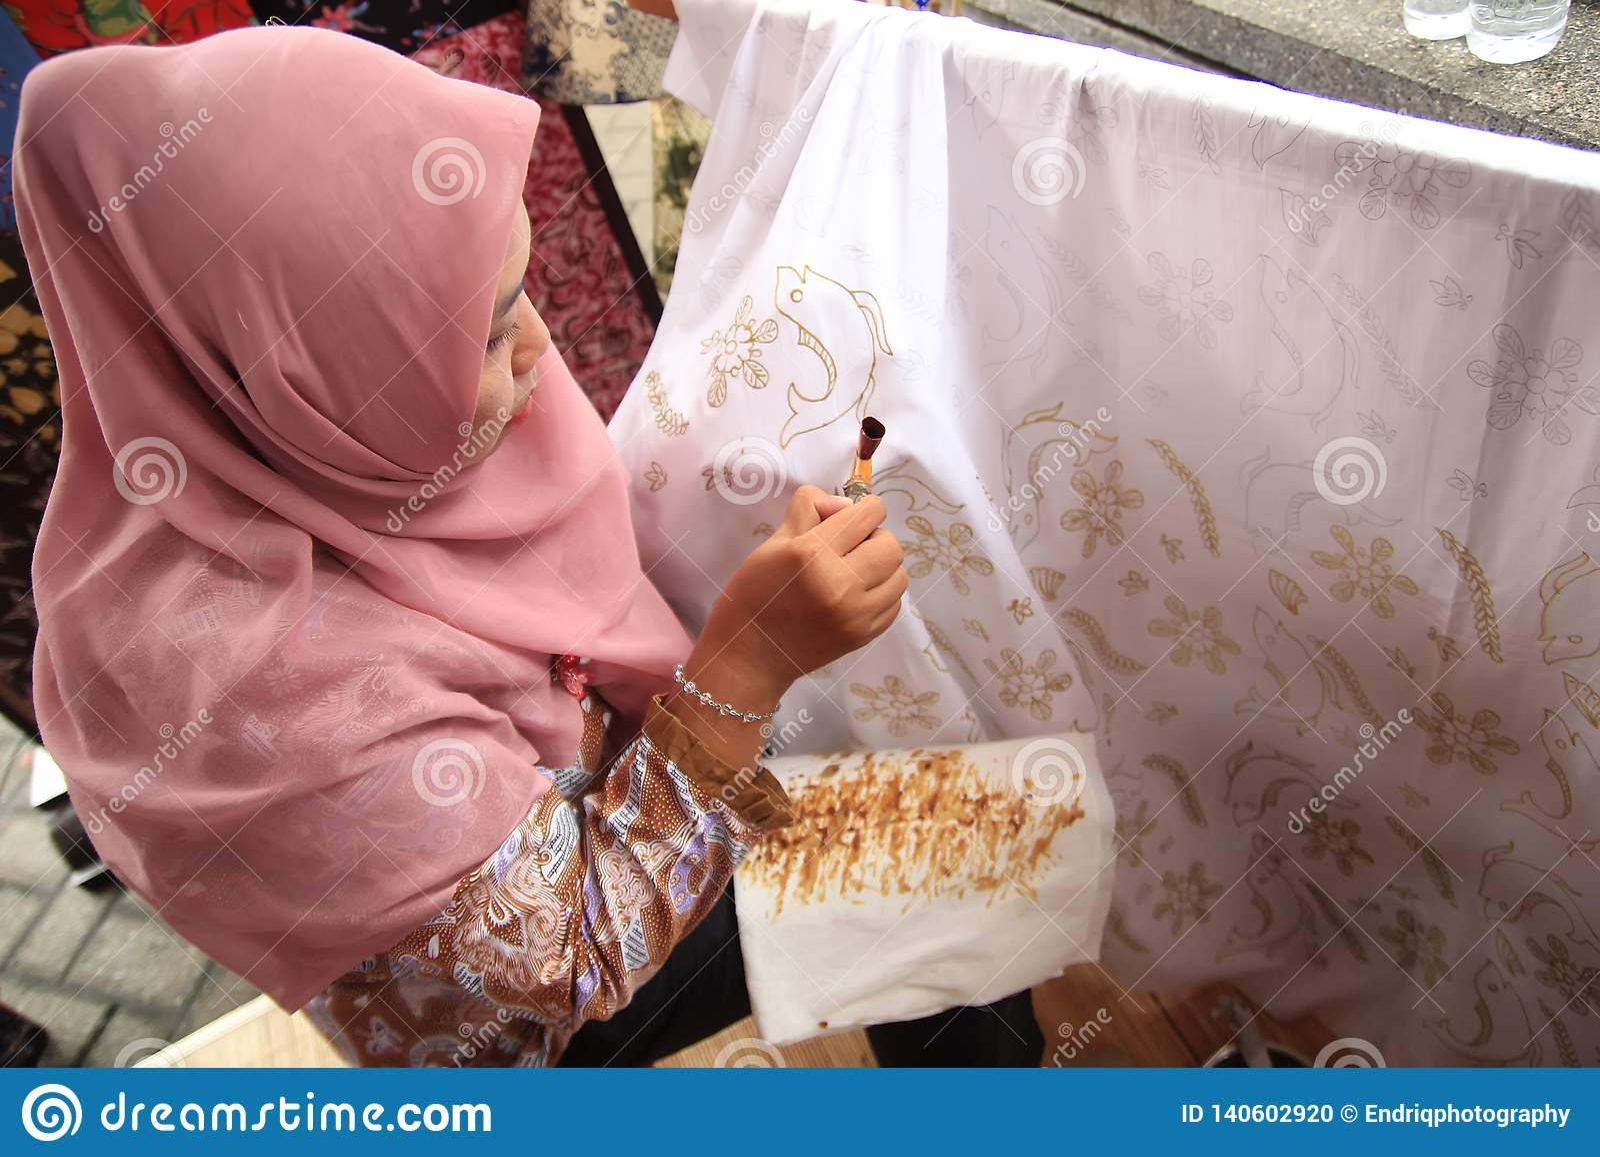 Surabaya indonesia. August 20, 2015. A woman makes a batik motif using canting